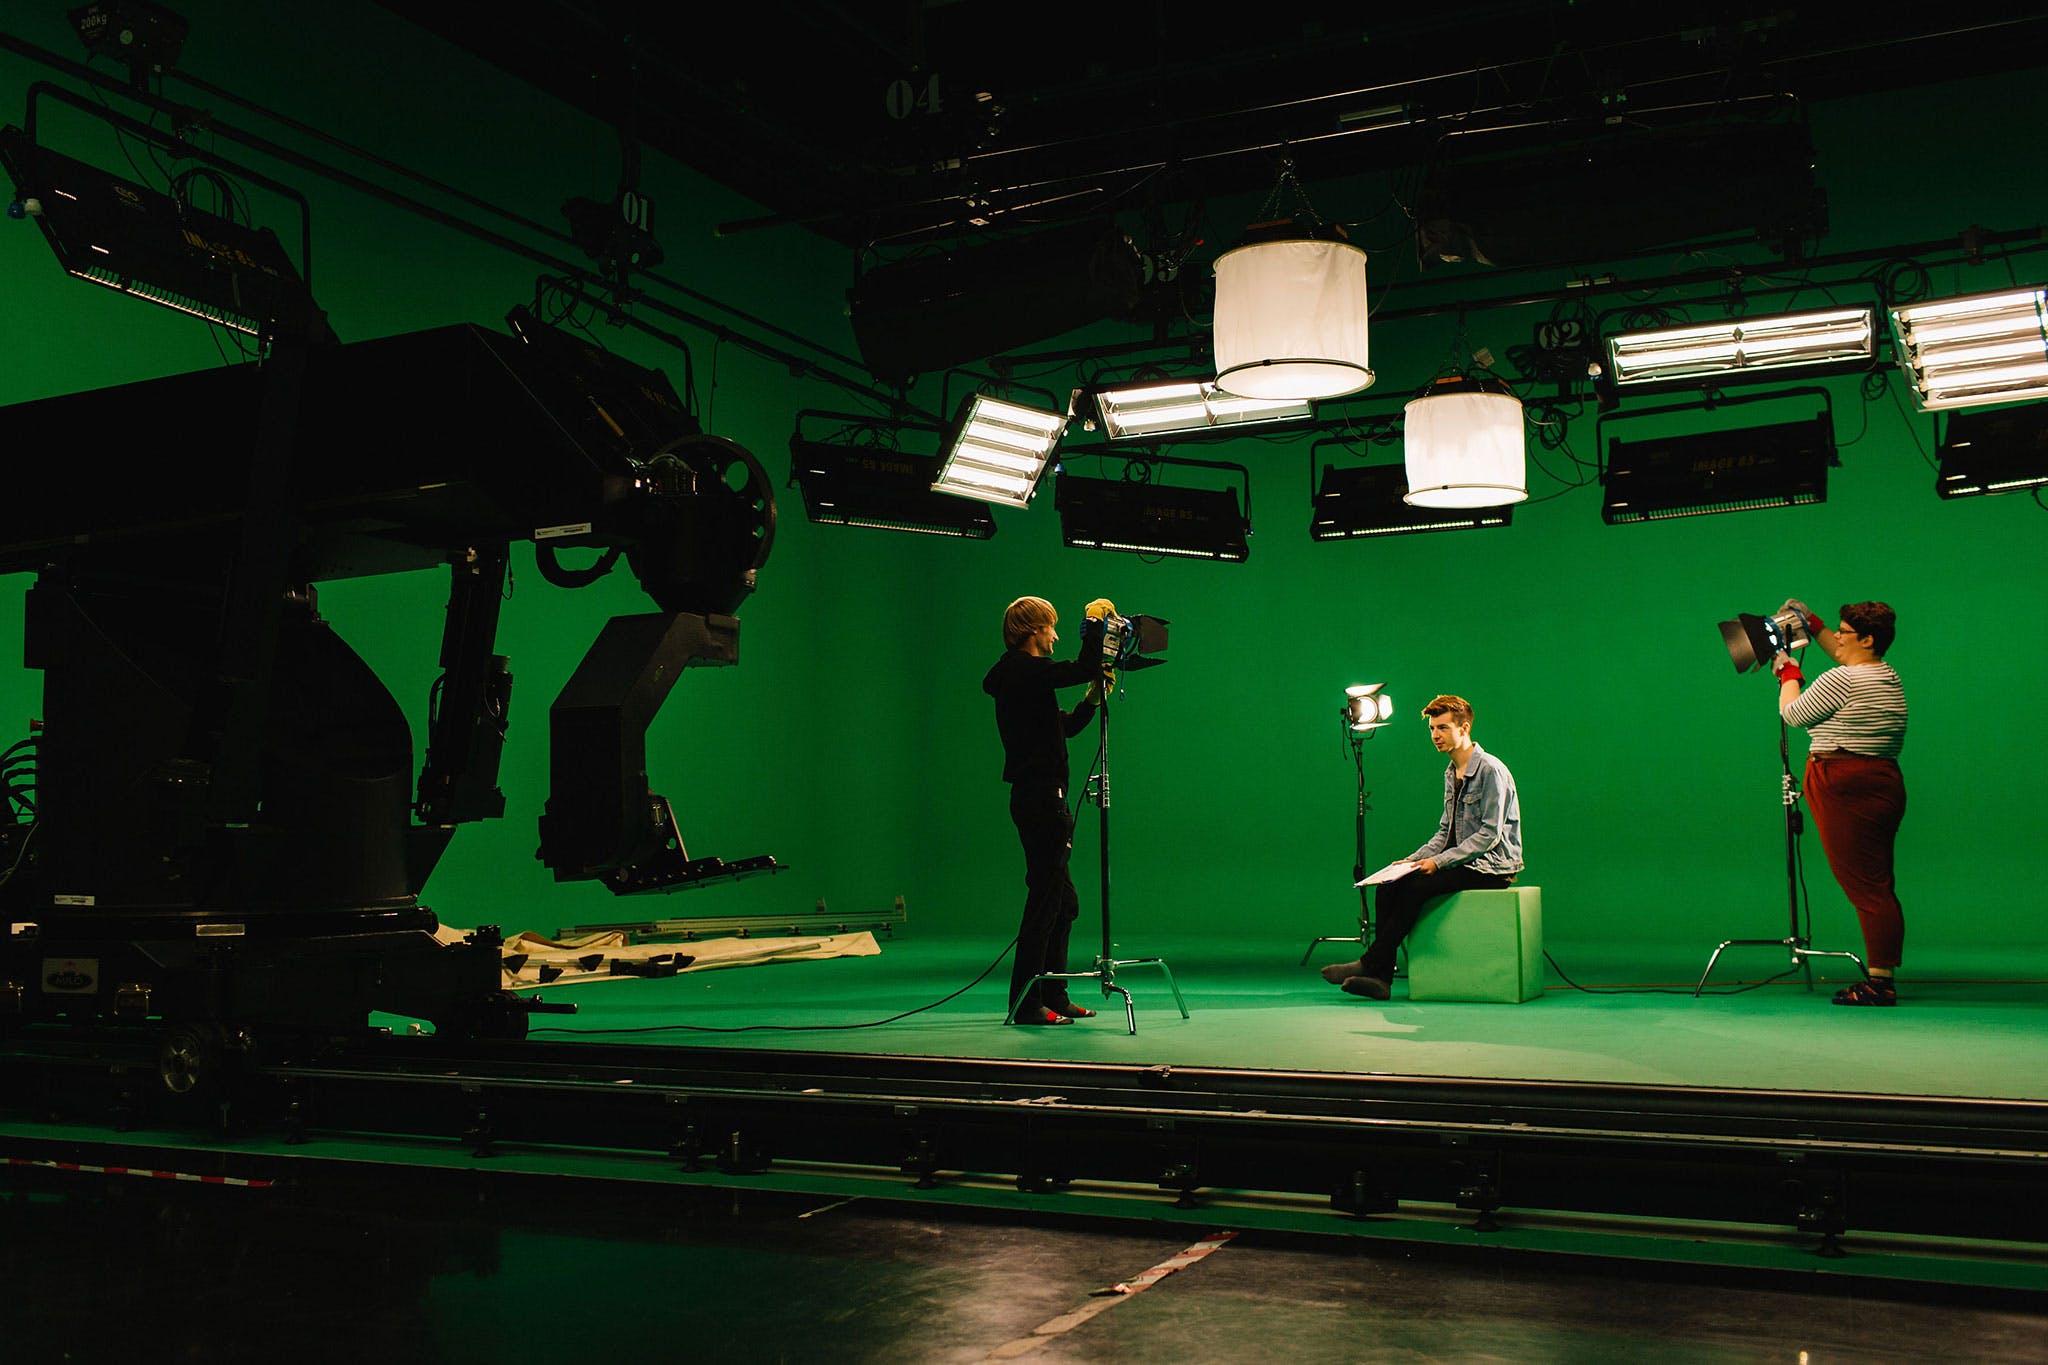 TV Studio B (Giant Green Screen)